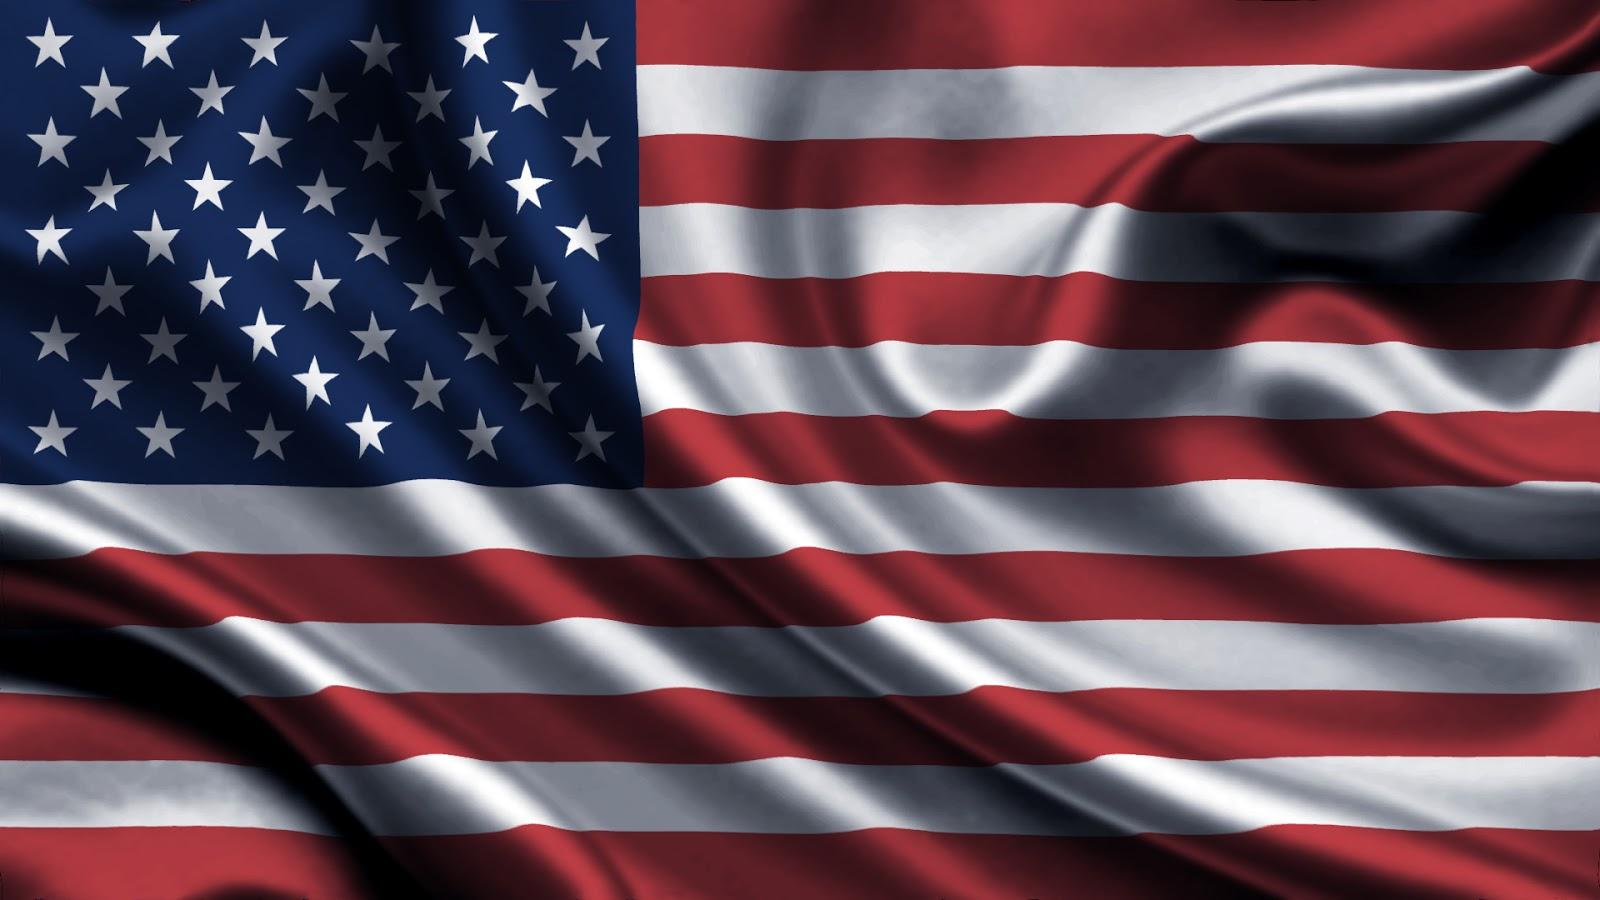 Imagenes Del America Para Fondo De Pantalla: Fondos De Pantalla HD